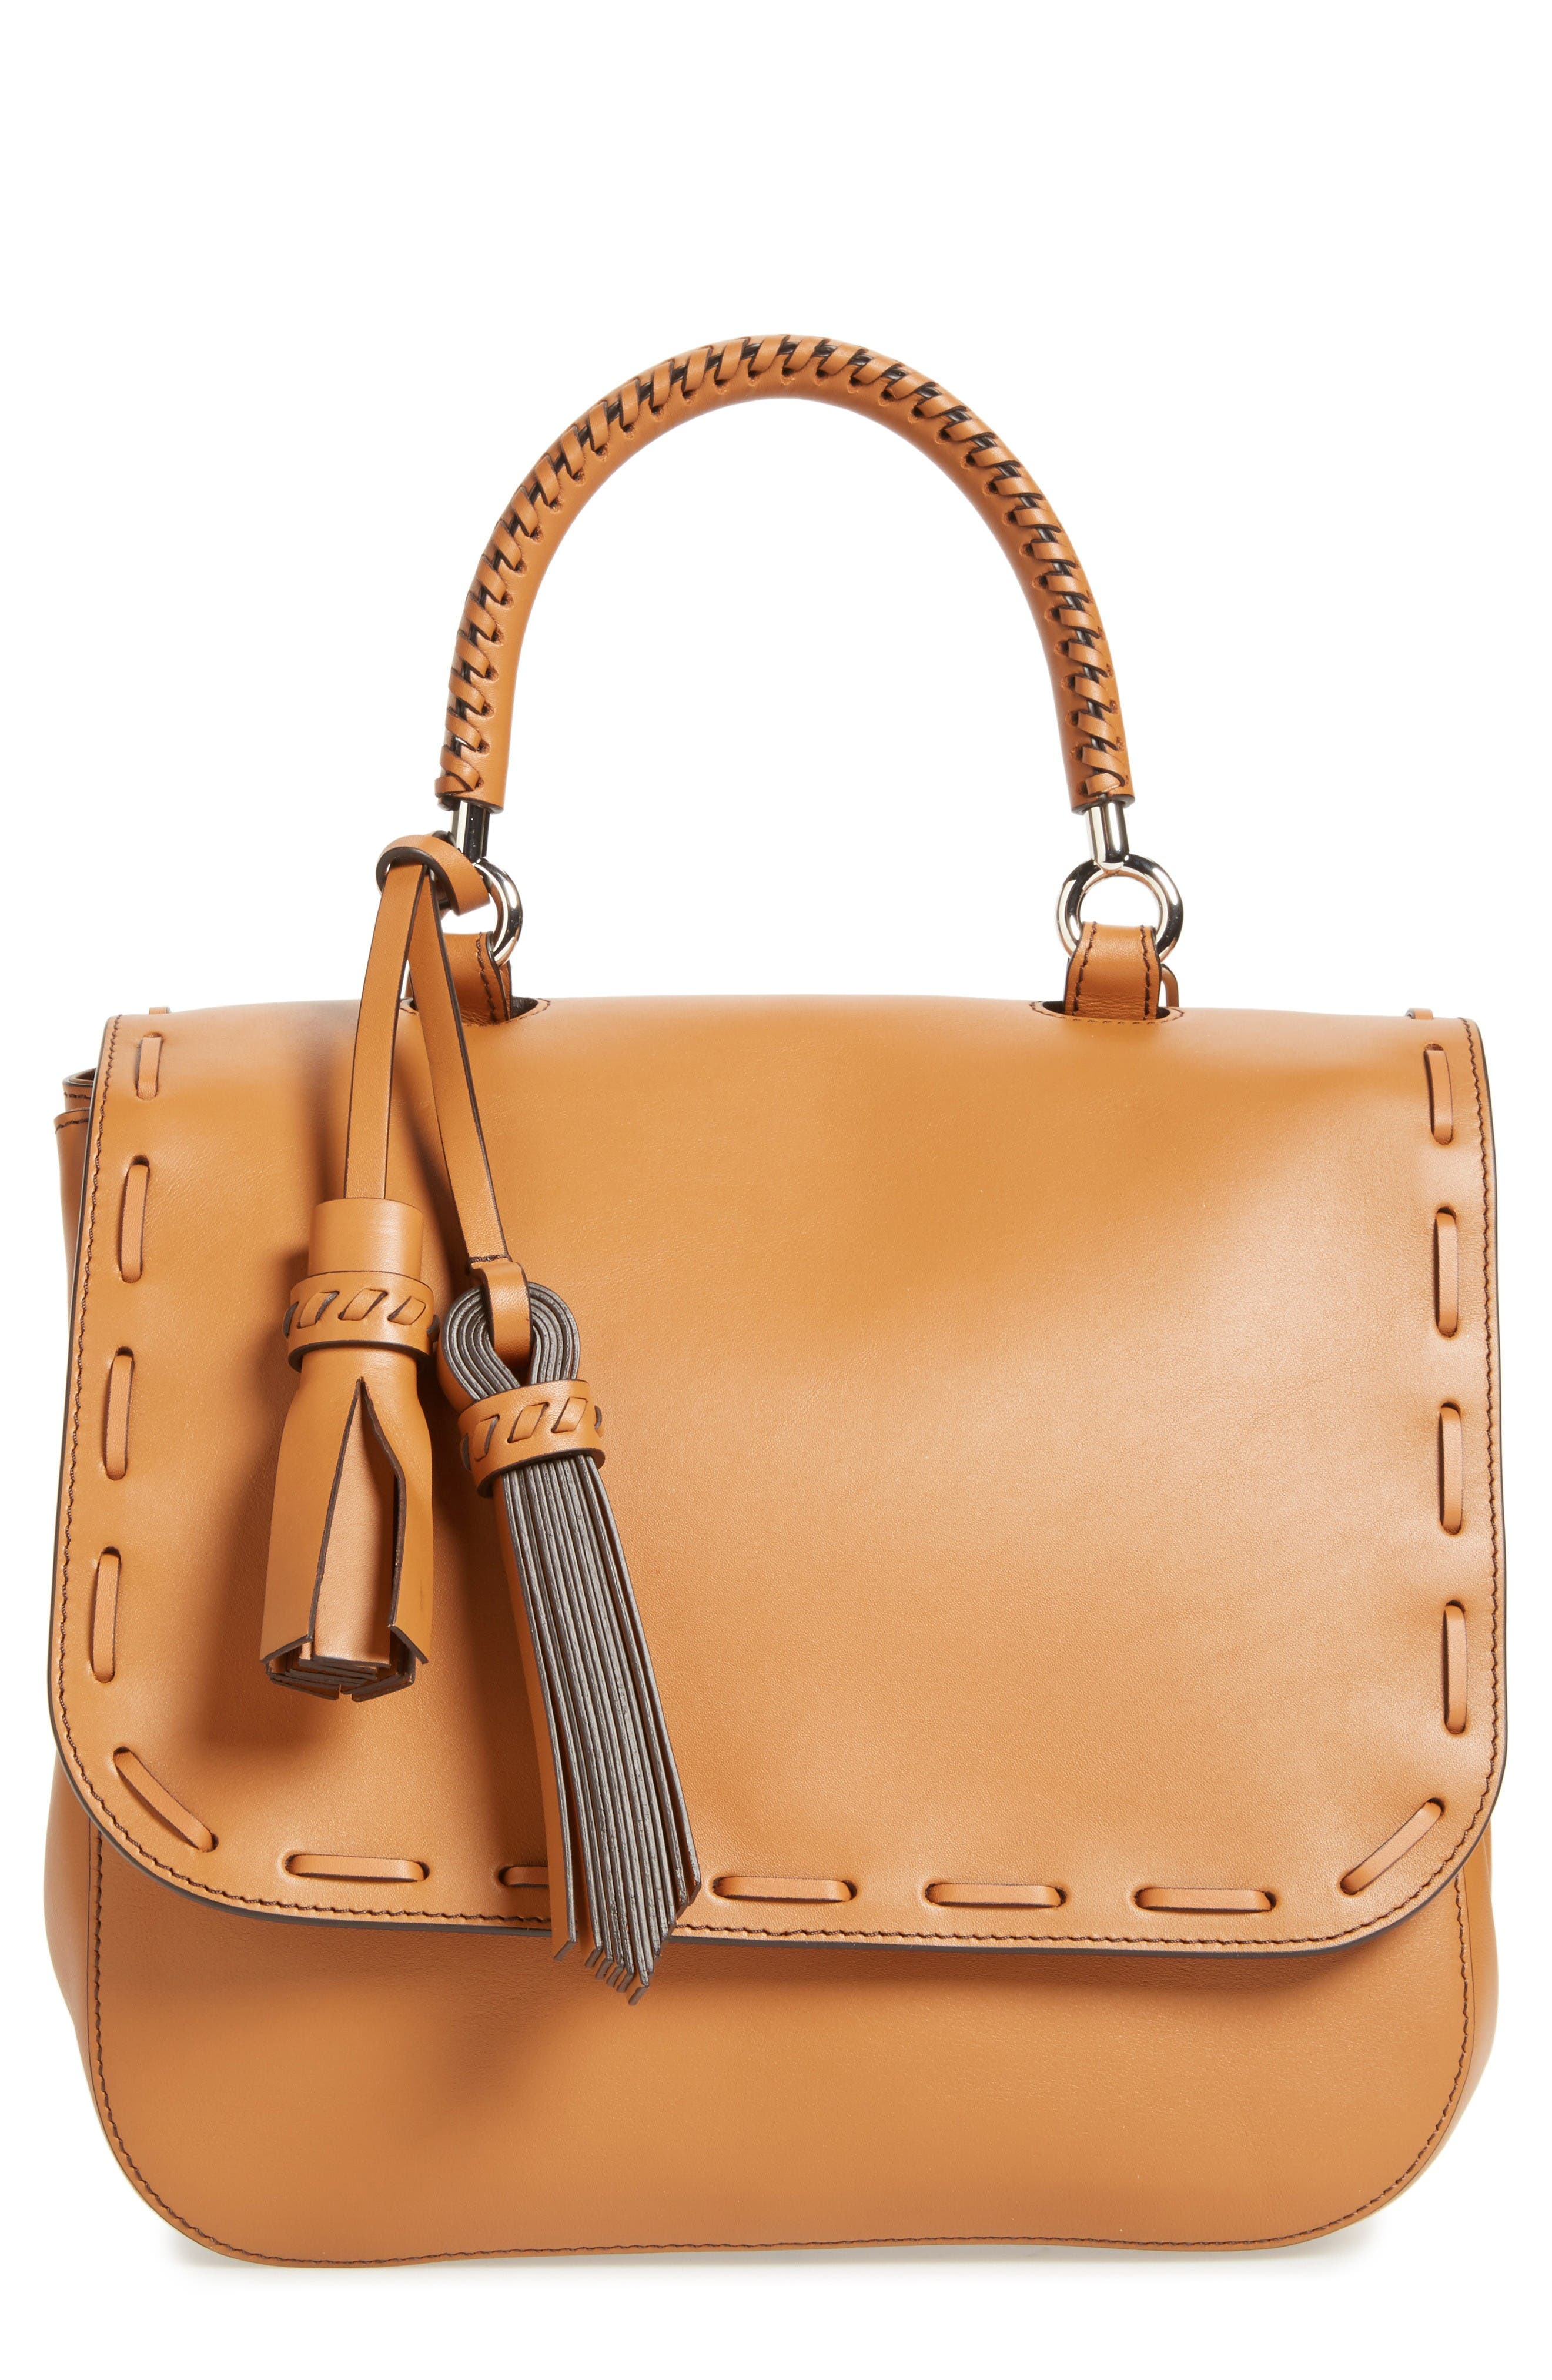 Alternate Image 1 Selected - Max Mara BoBag Leather Satchel